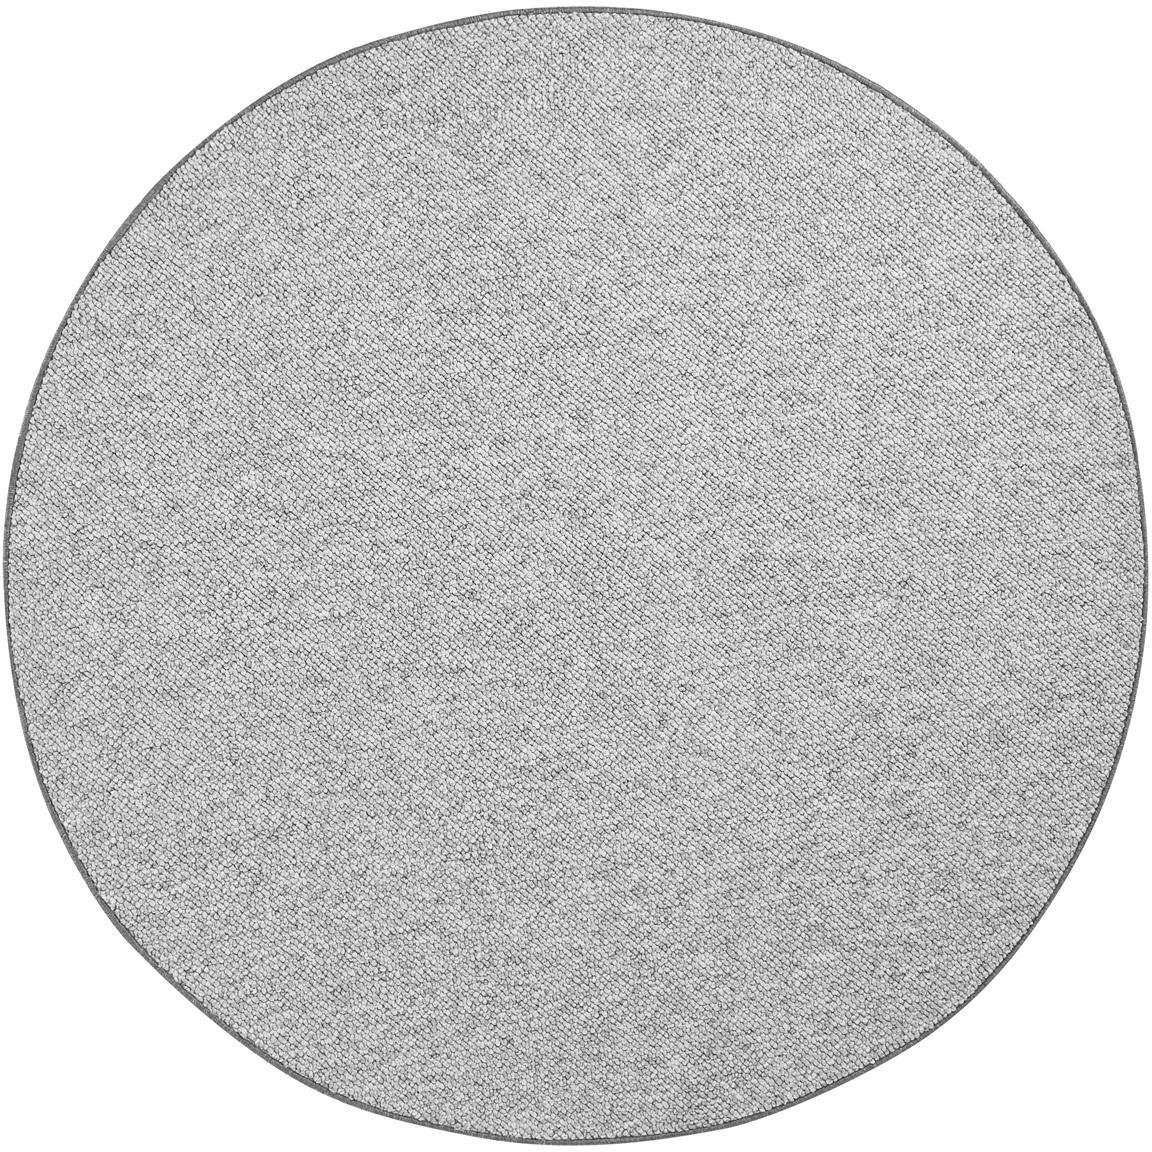 Tappeto rotondo Lyon, Retro: pelo, Grigio, mescolato, Ø 200 cm (taglia L)